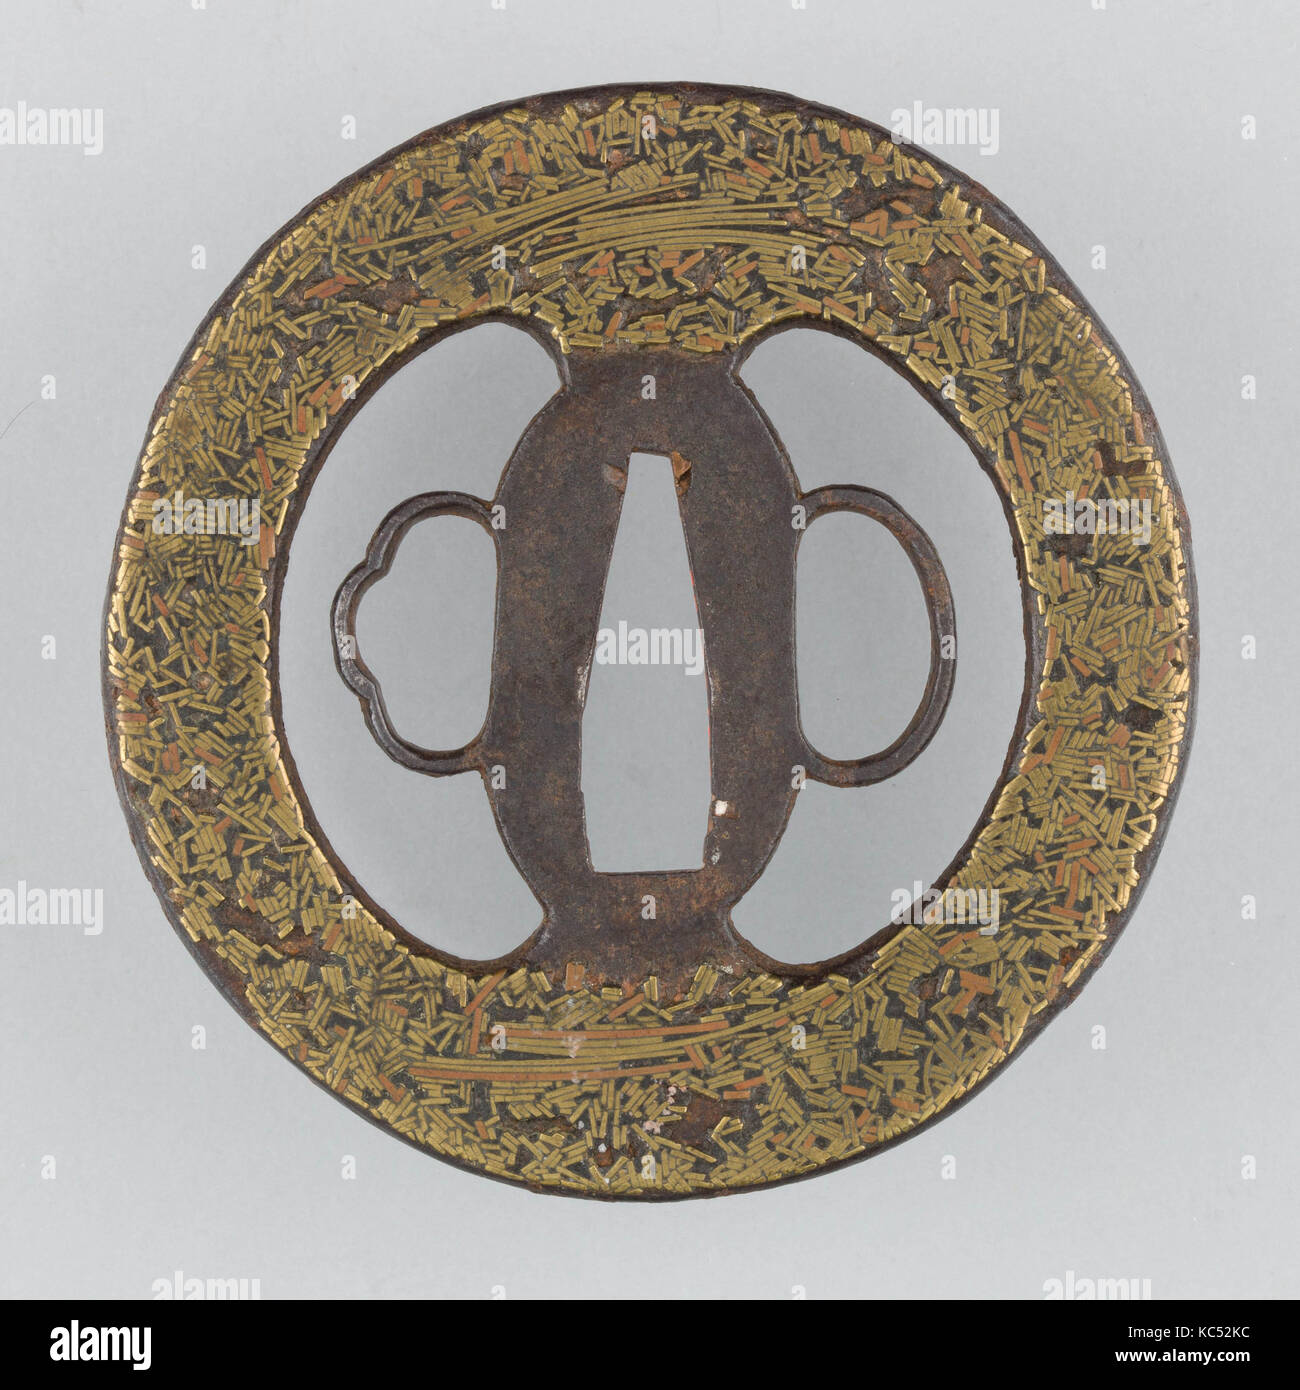 Sword guard tsuba 17th century japanese iron brass copper sword guard tsuba 17th century japanese iron brass copper diam 3 in 76 cm thickness 316 in 05 cm wt 42 oz buycottarizona Image collections